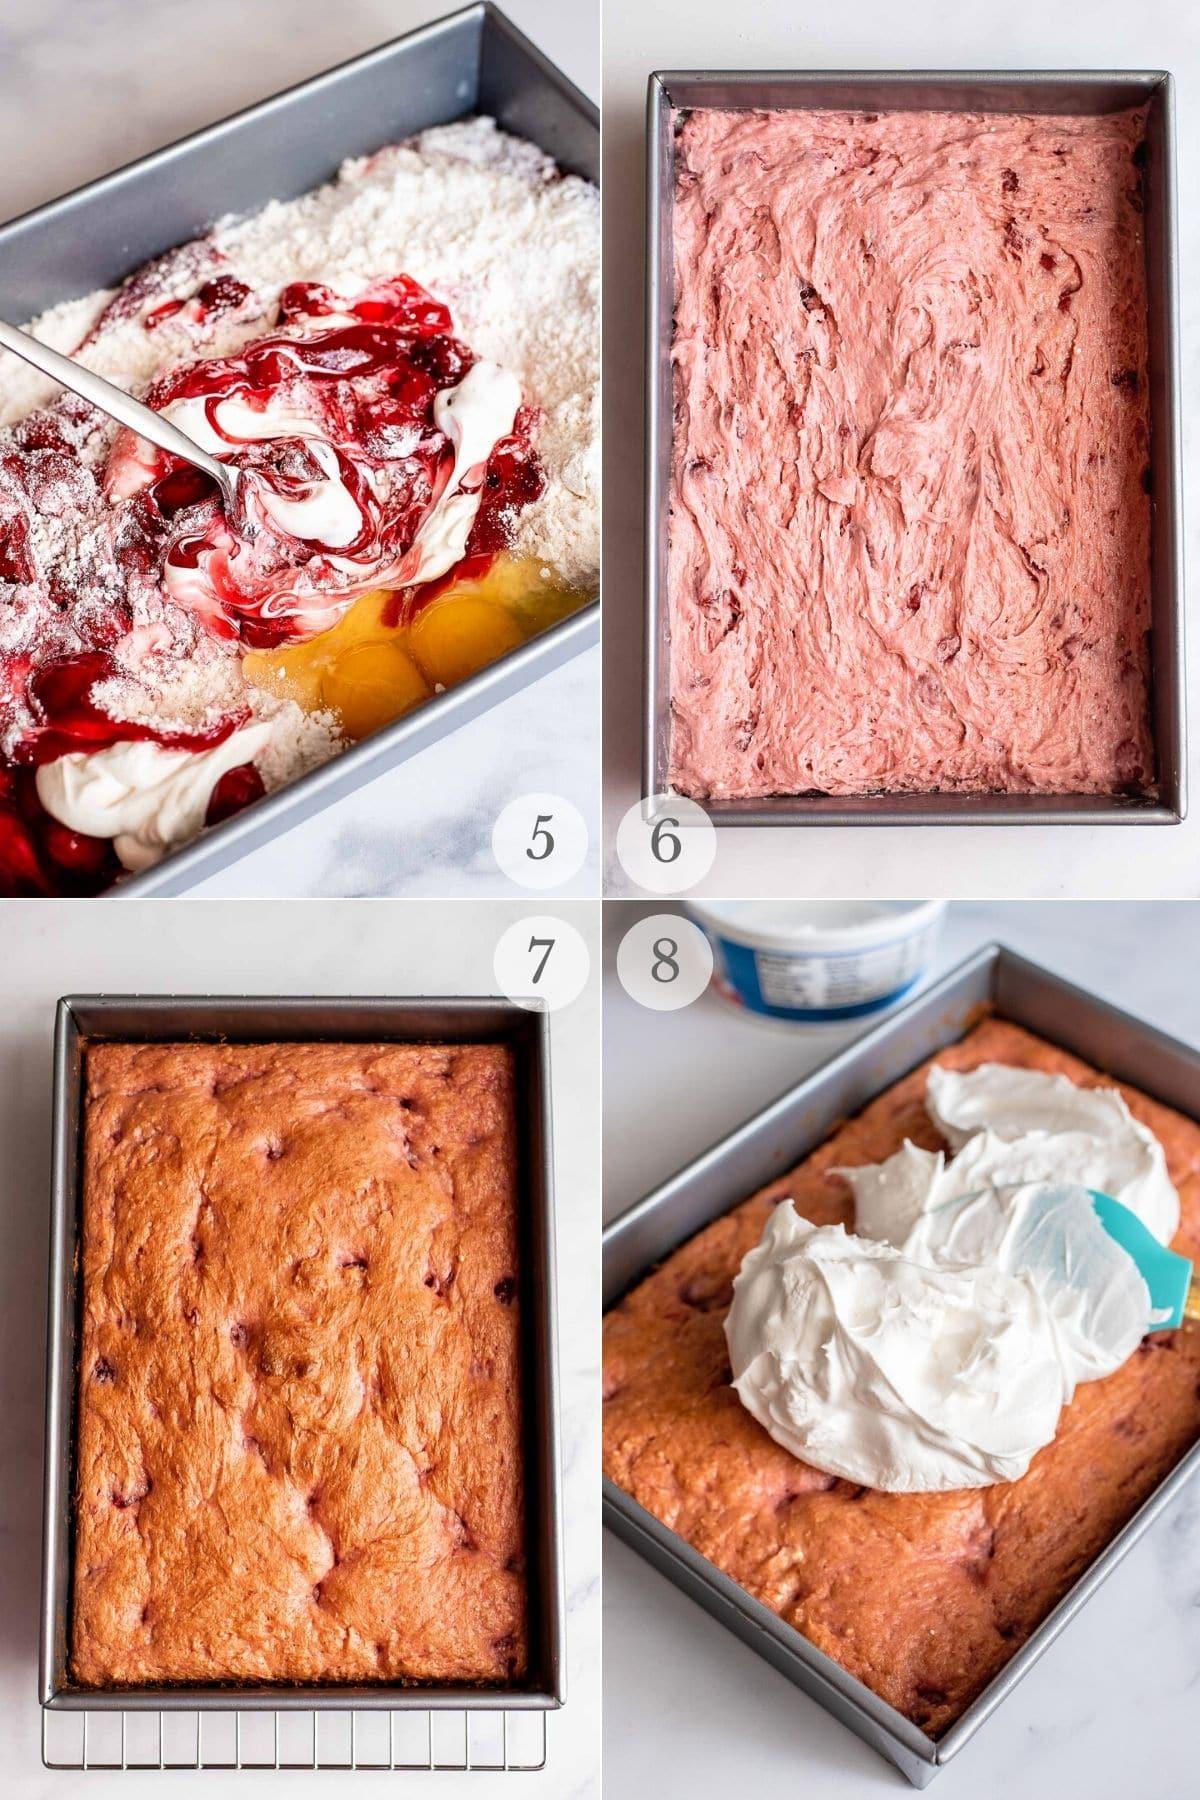 cherry cake recipe steps 5-8